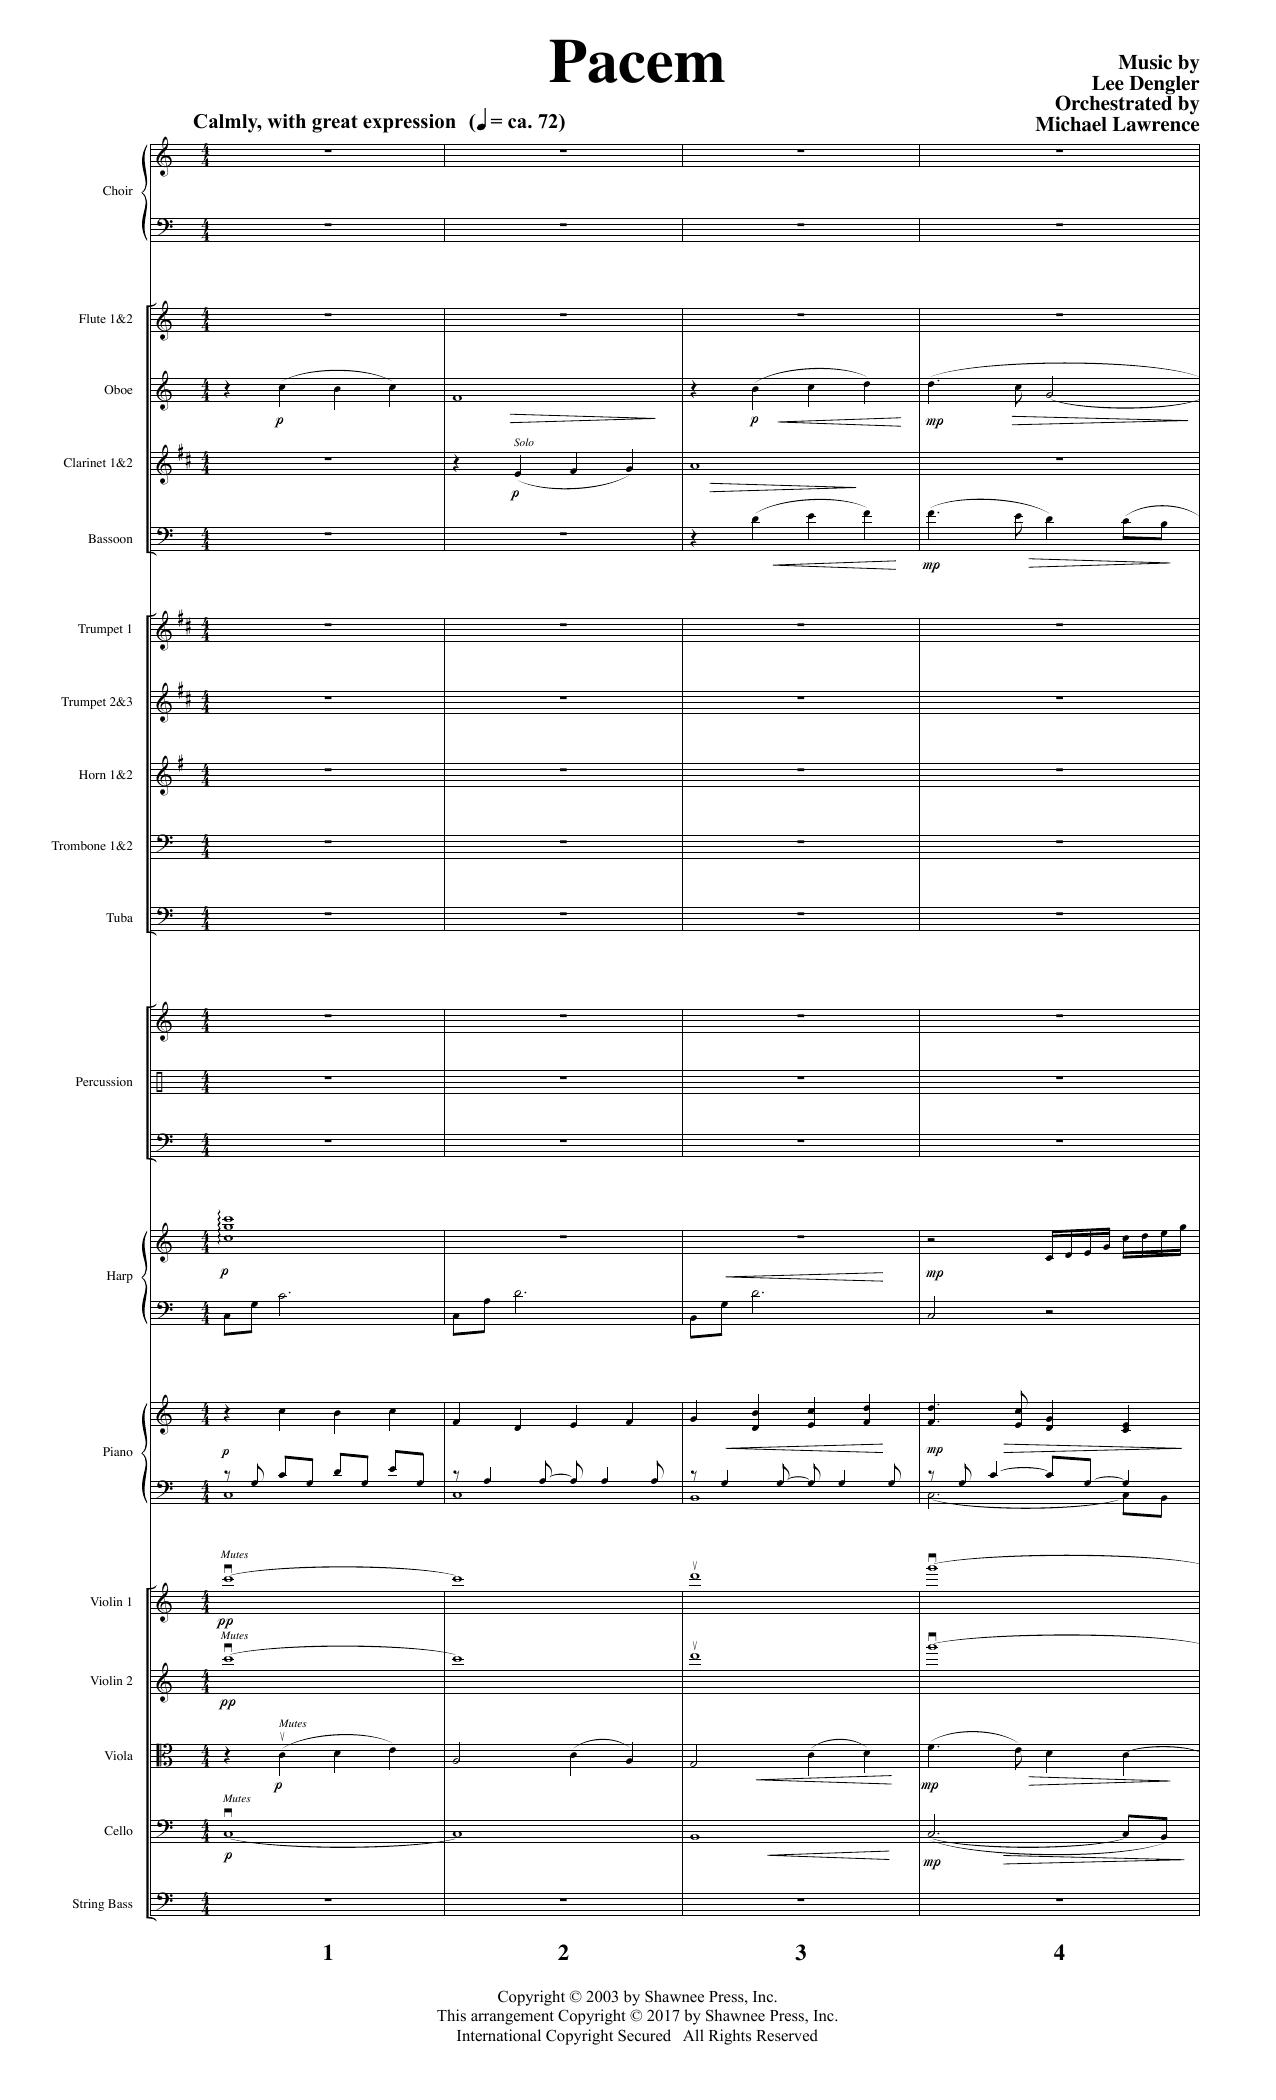 Pacem - Score